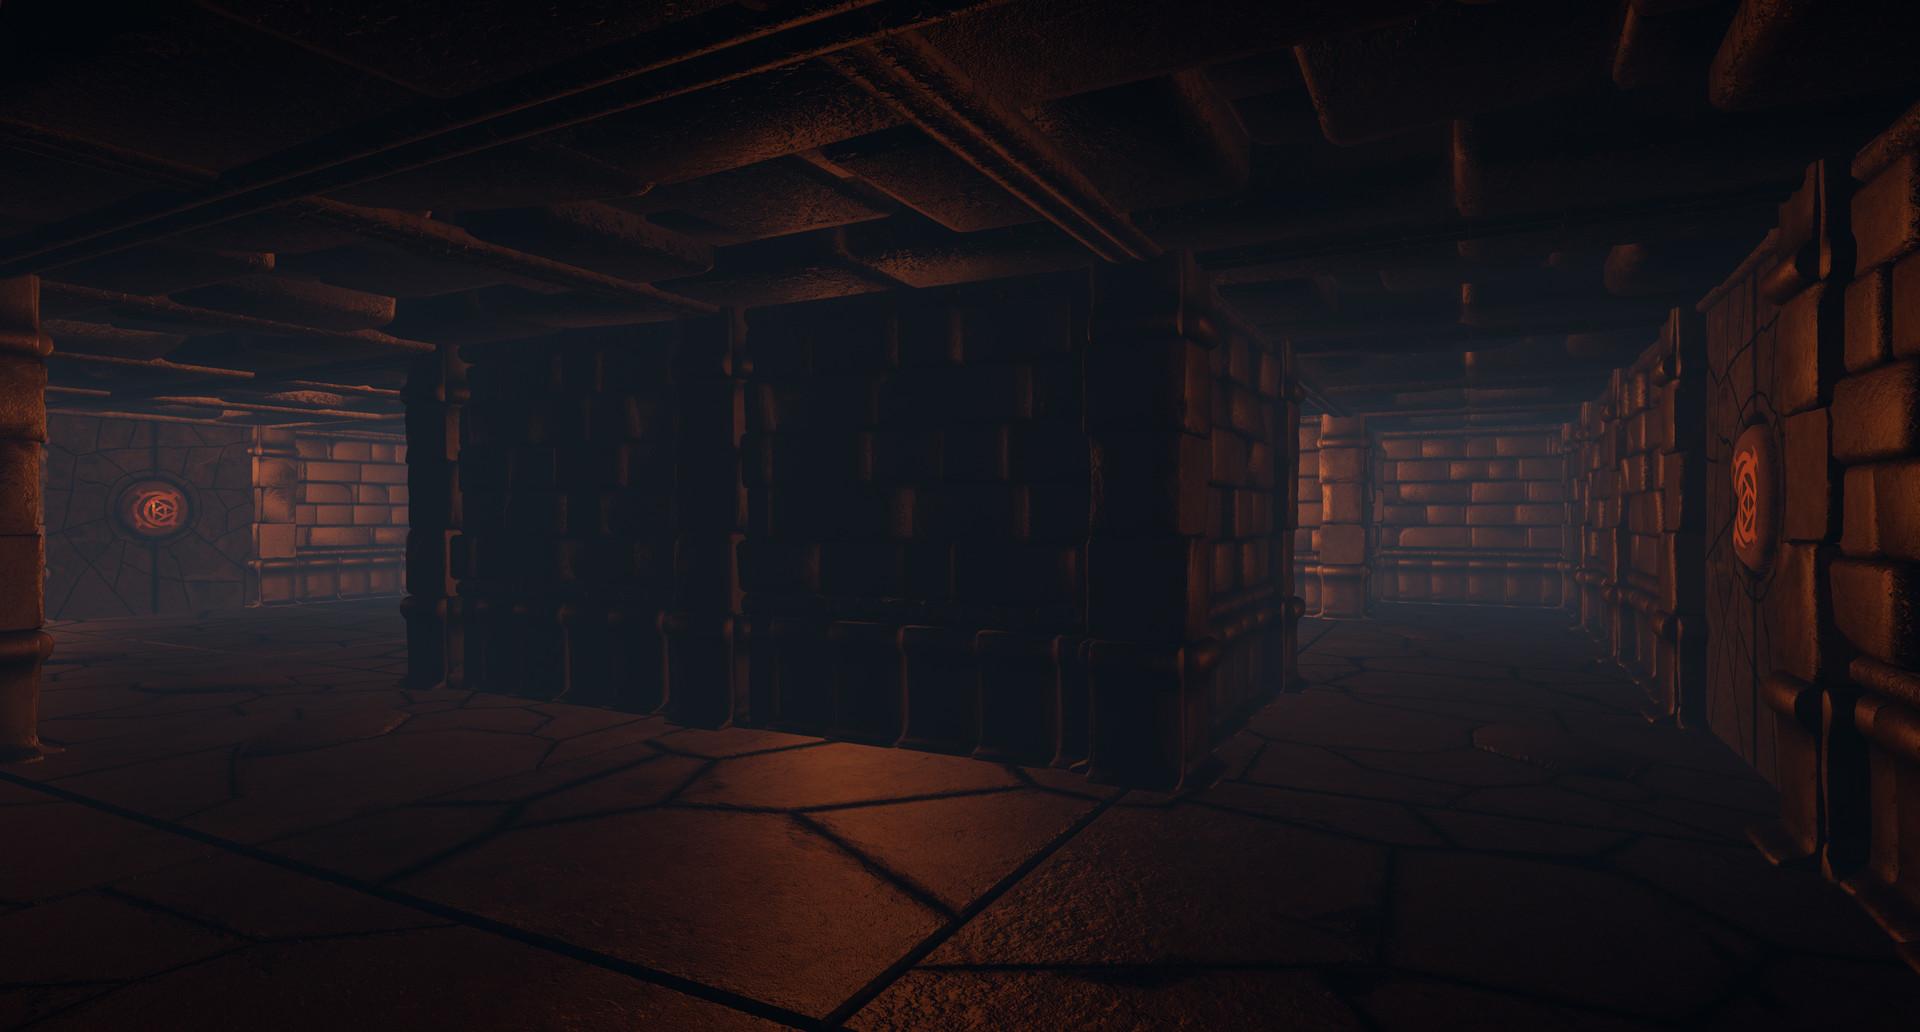 ArtStation - Procedural Dungeon Generator, Christopher Hollywood